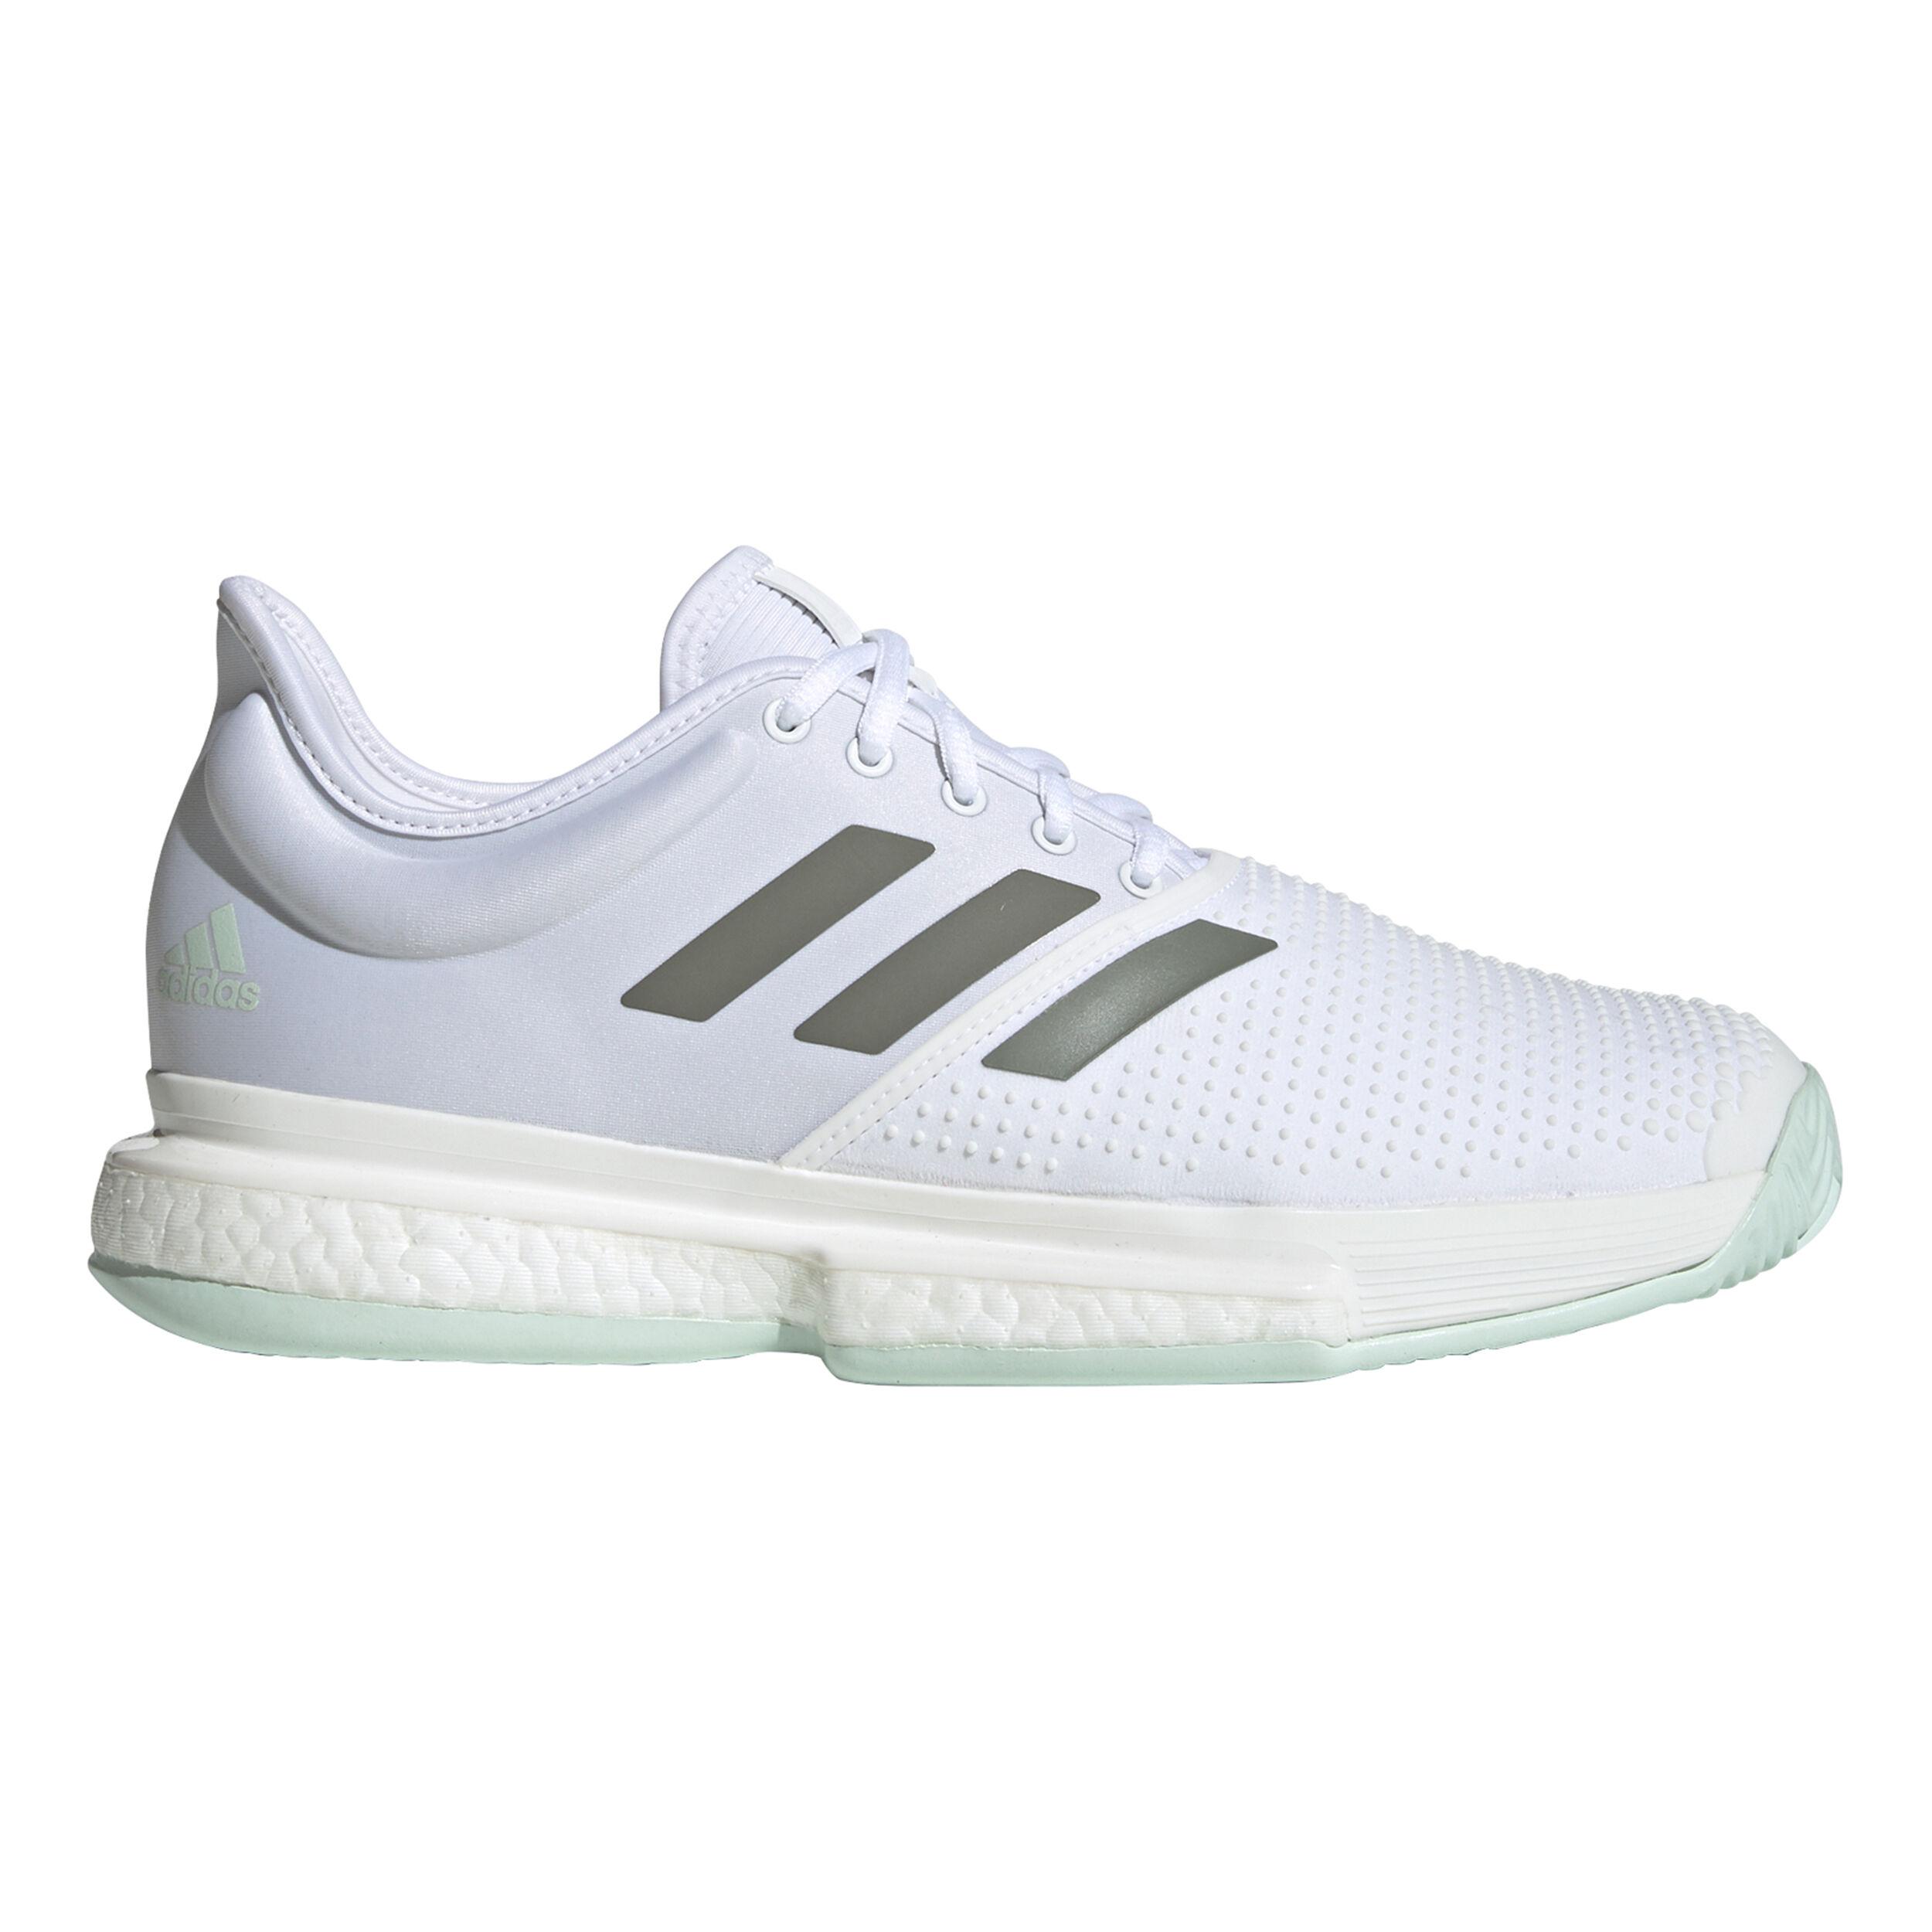 Sole Court Boost Chaussure Tout Terrain Hommes Blanc , Mint